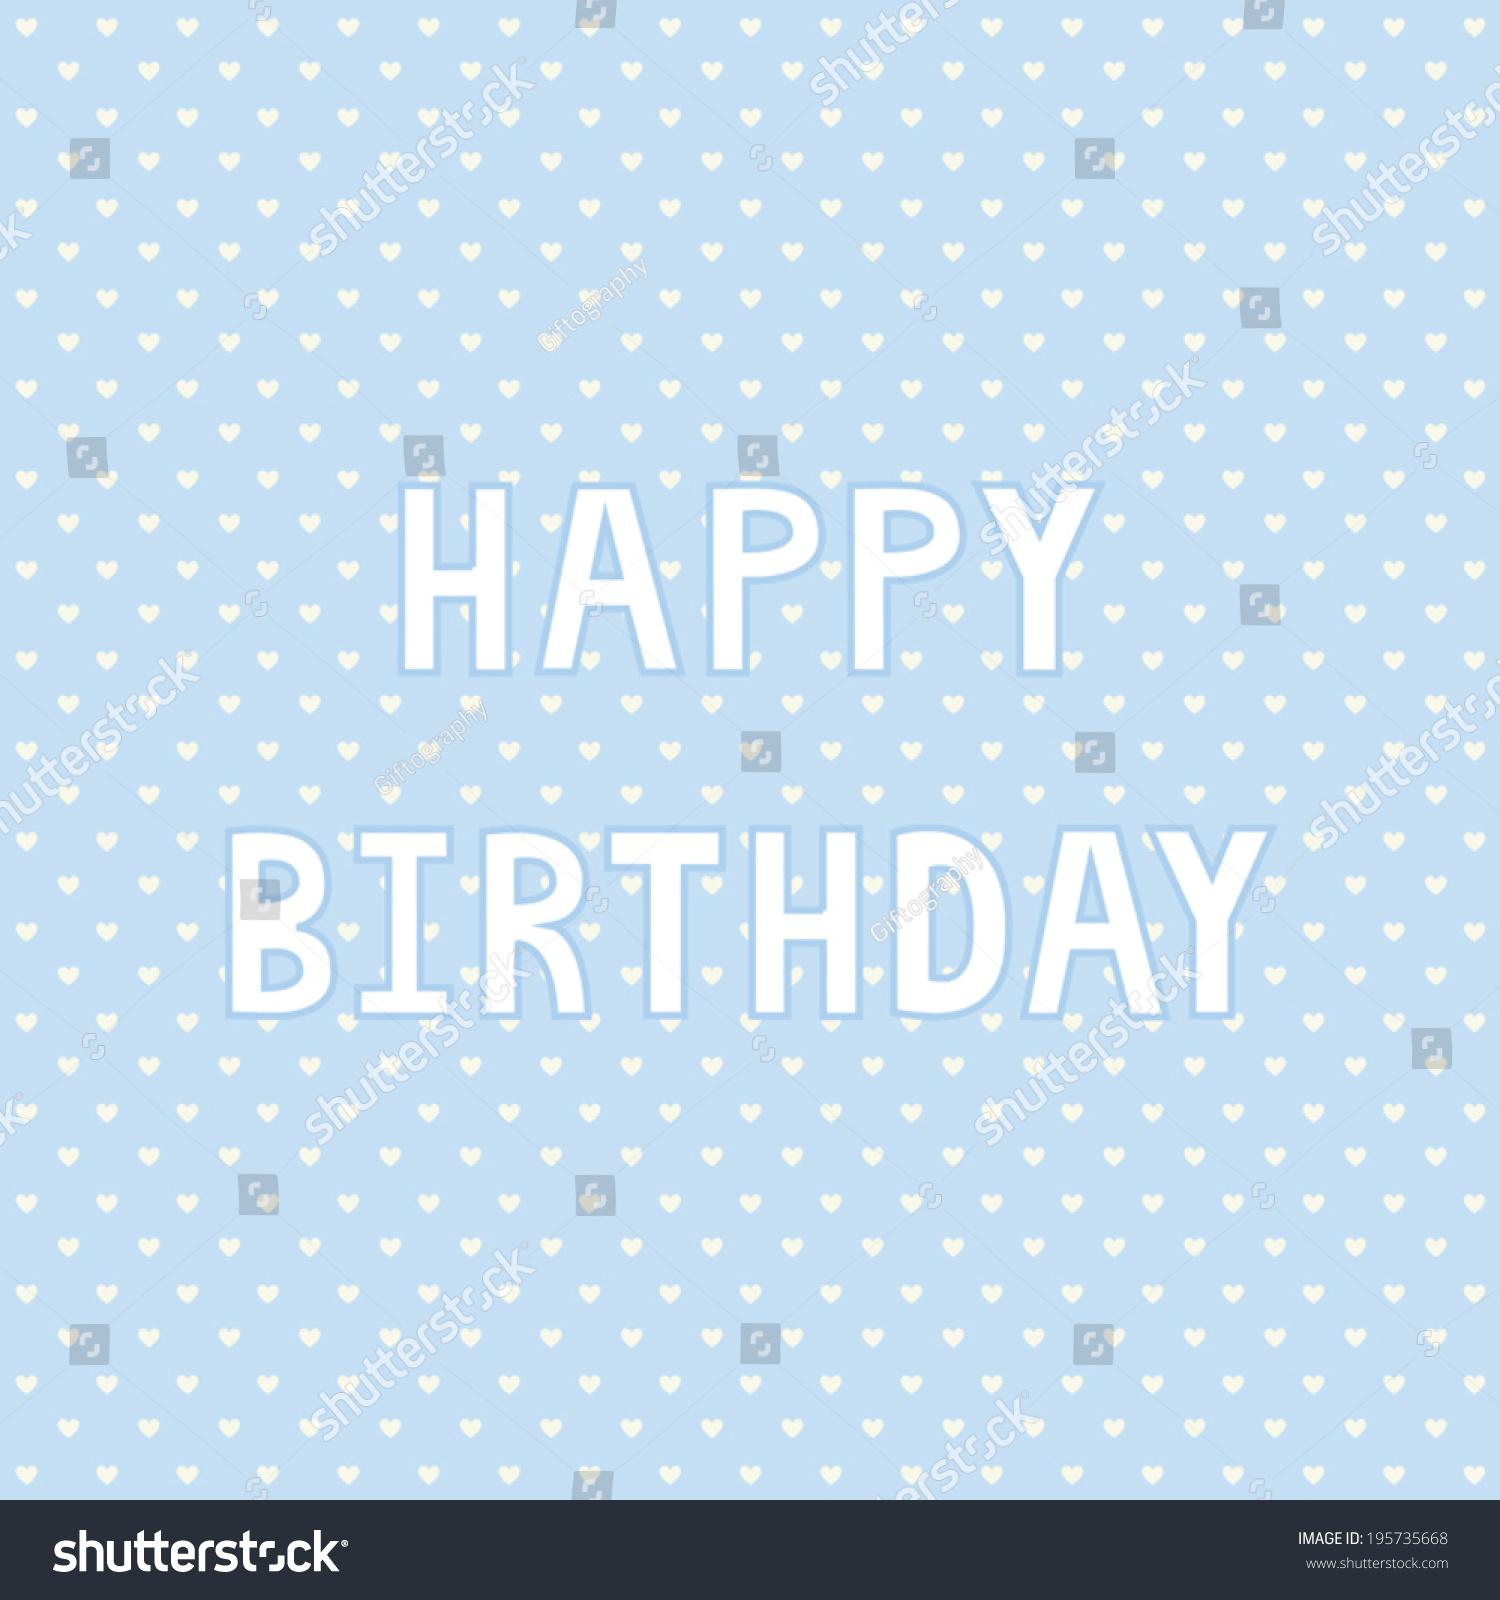 Happy Birthday Card Decoration Stock Vector 195735668 Shutterstock